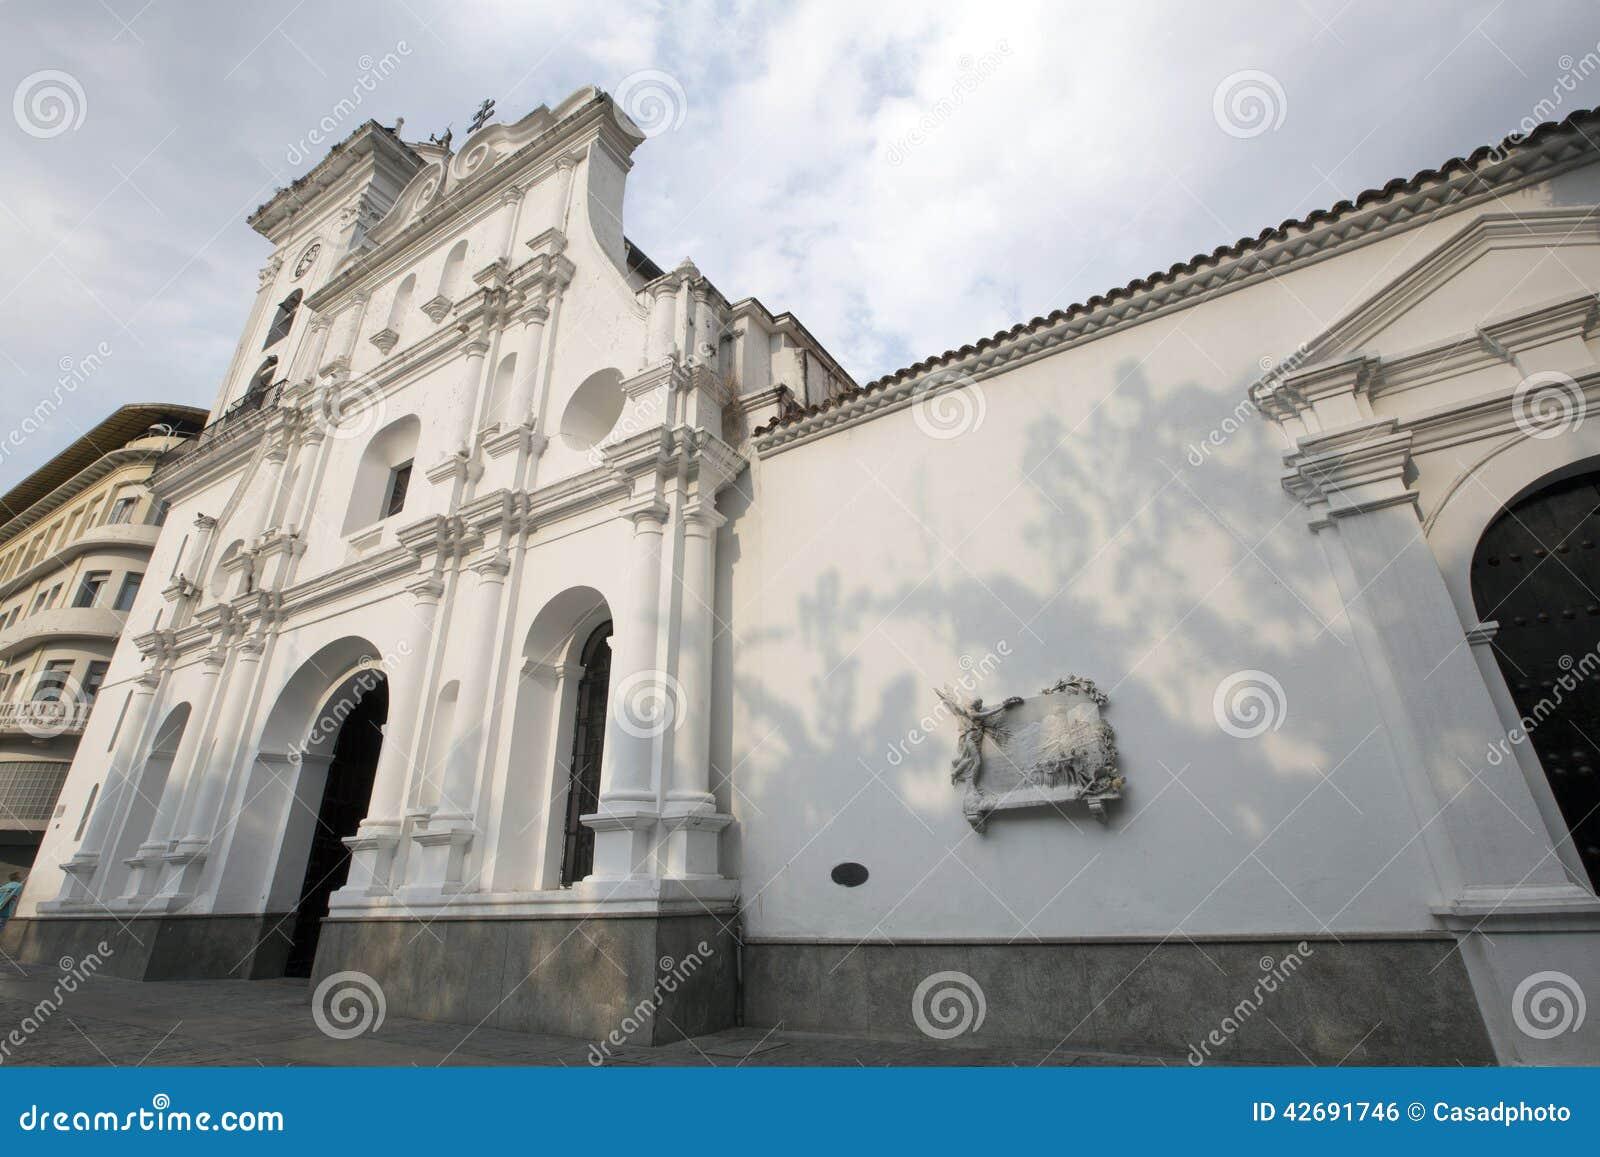 Catedral de caracas; venezuela